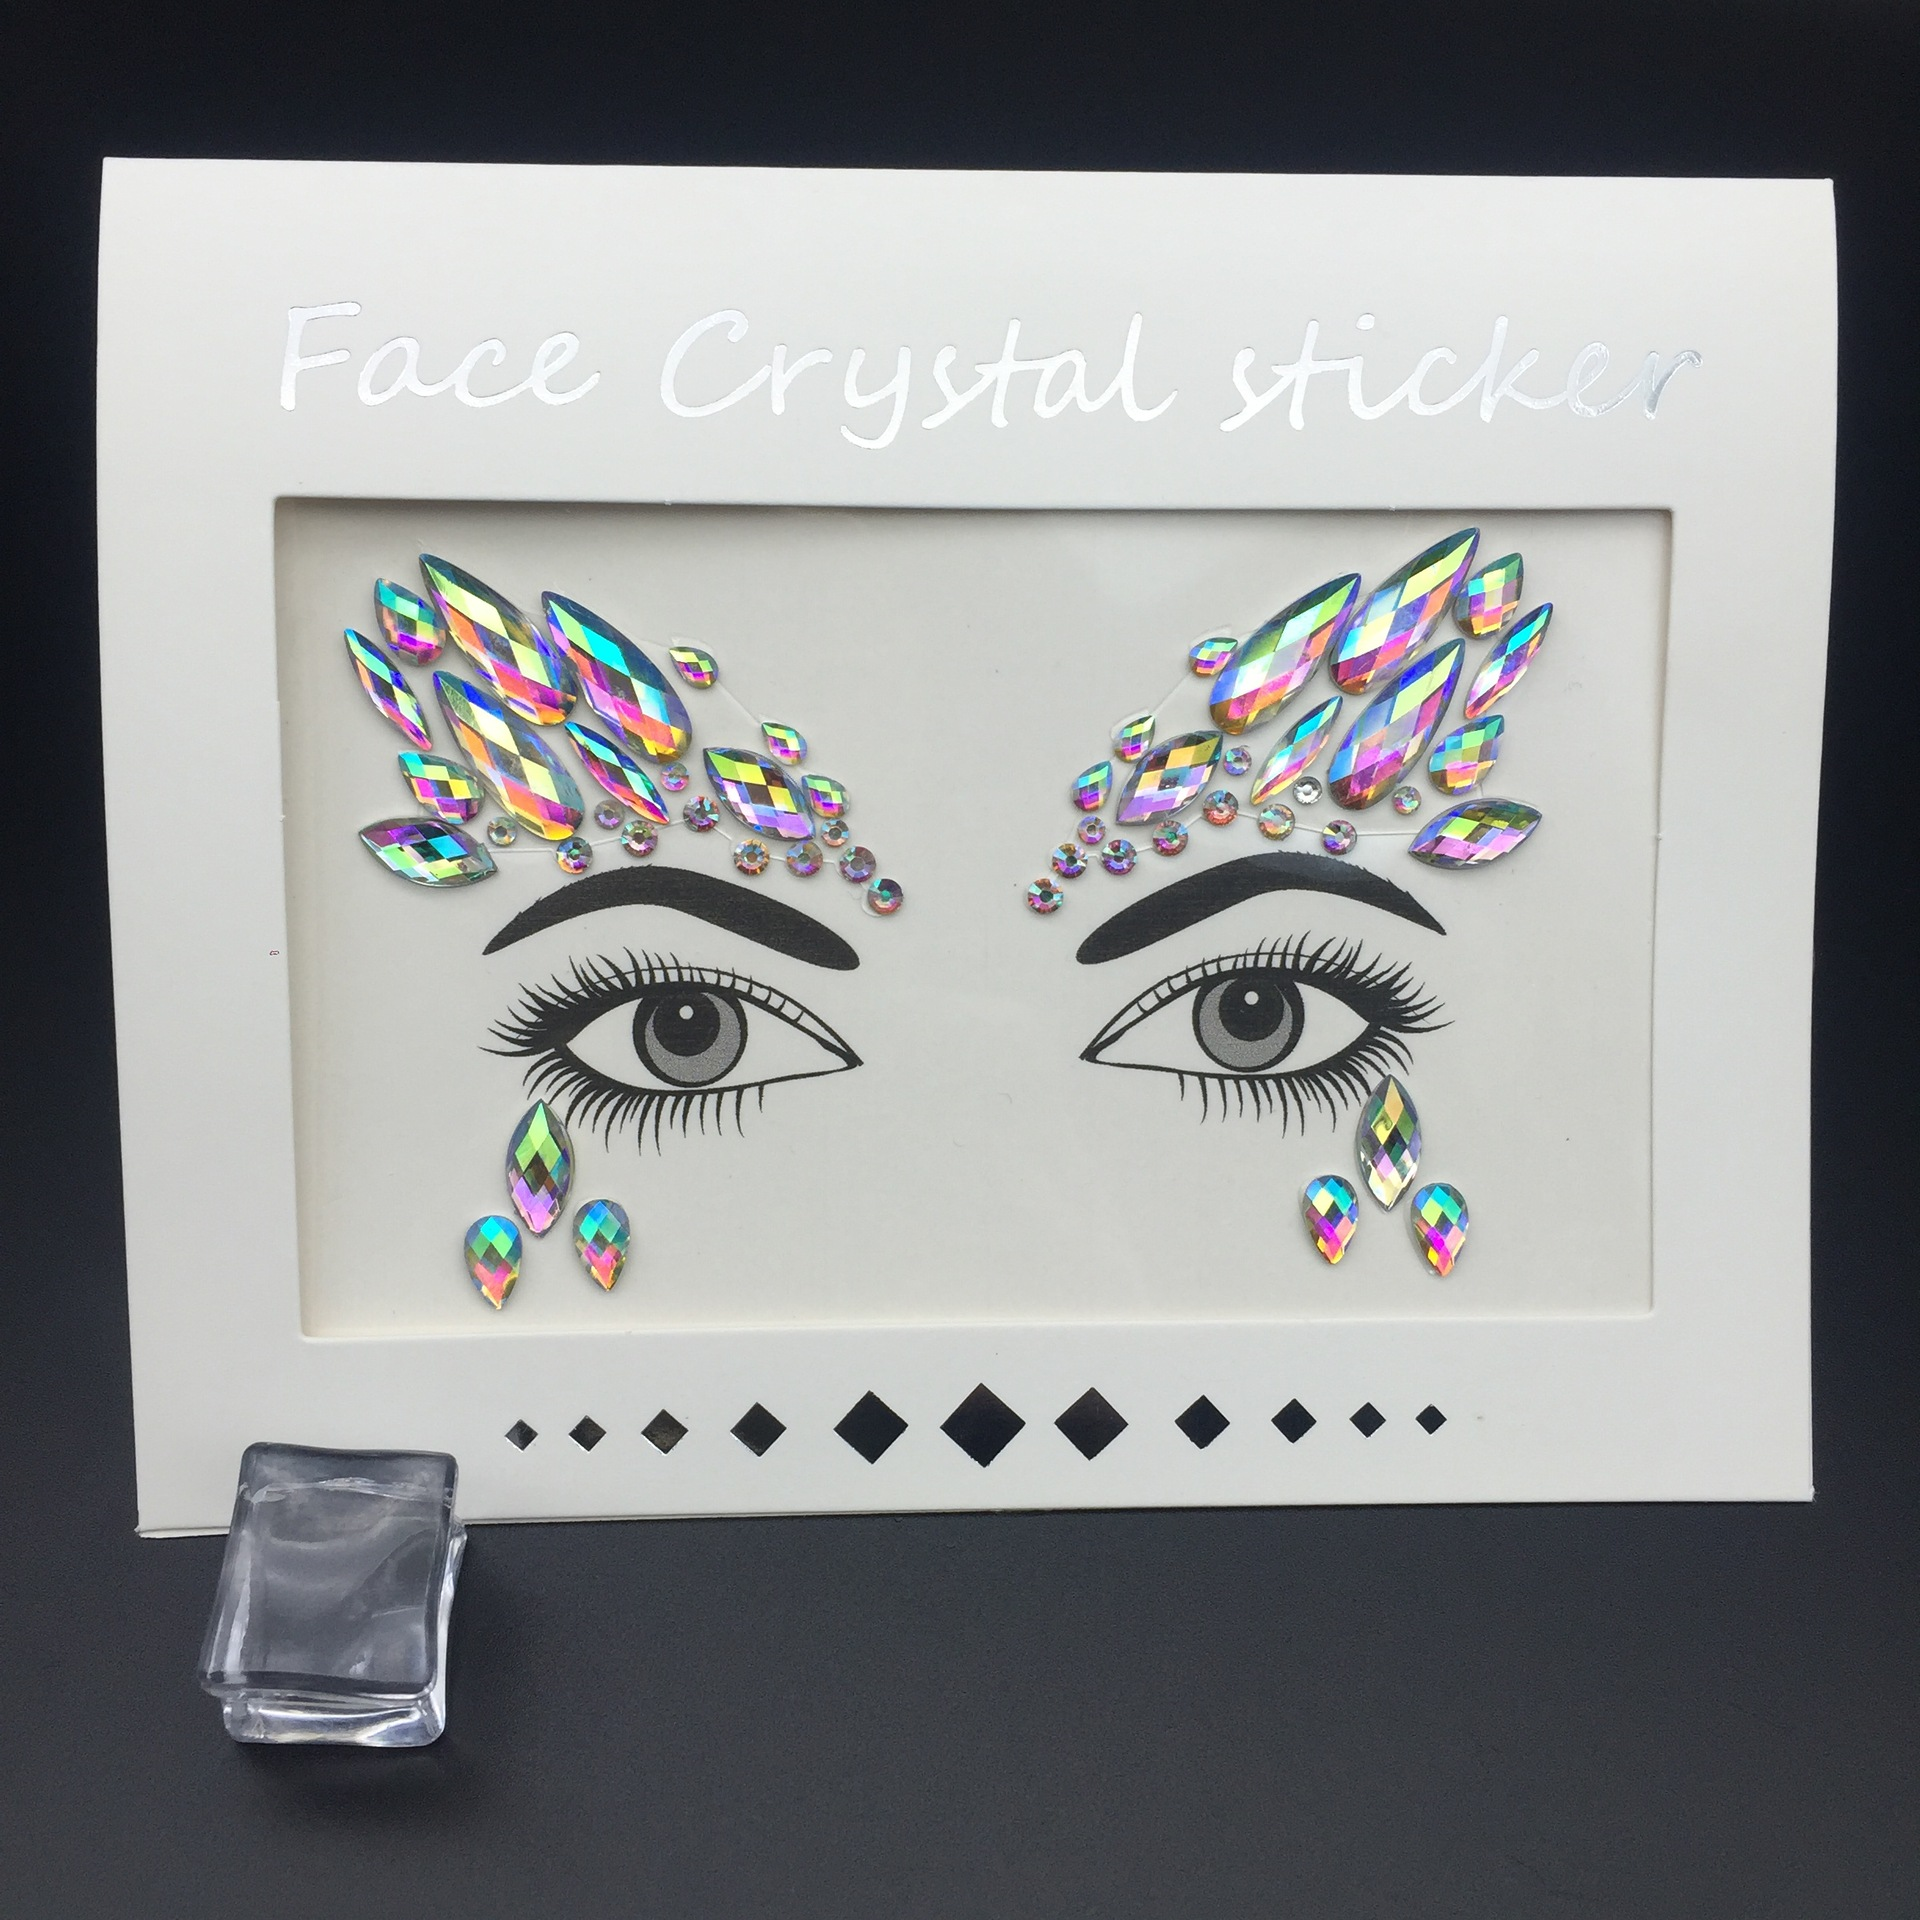 2020 Women Tattoo Diamond Makeup Eyeliner Eyeshadow Face Sticker Jewel Eyes Makeup Crystal Eyes Sticker 2019 Fashion